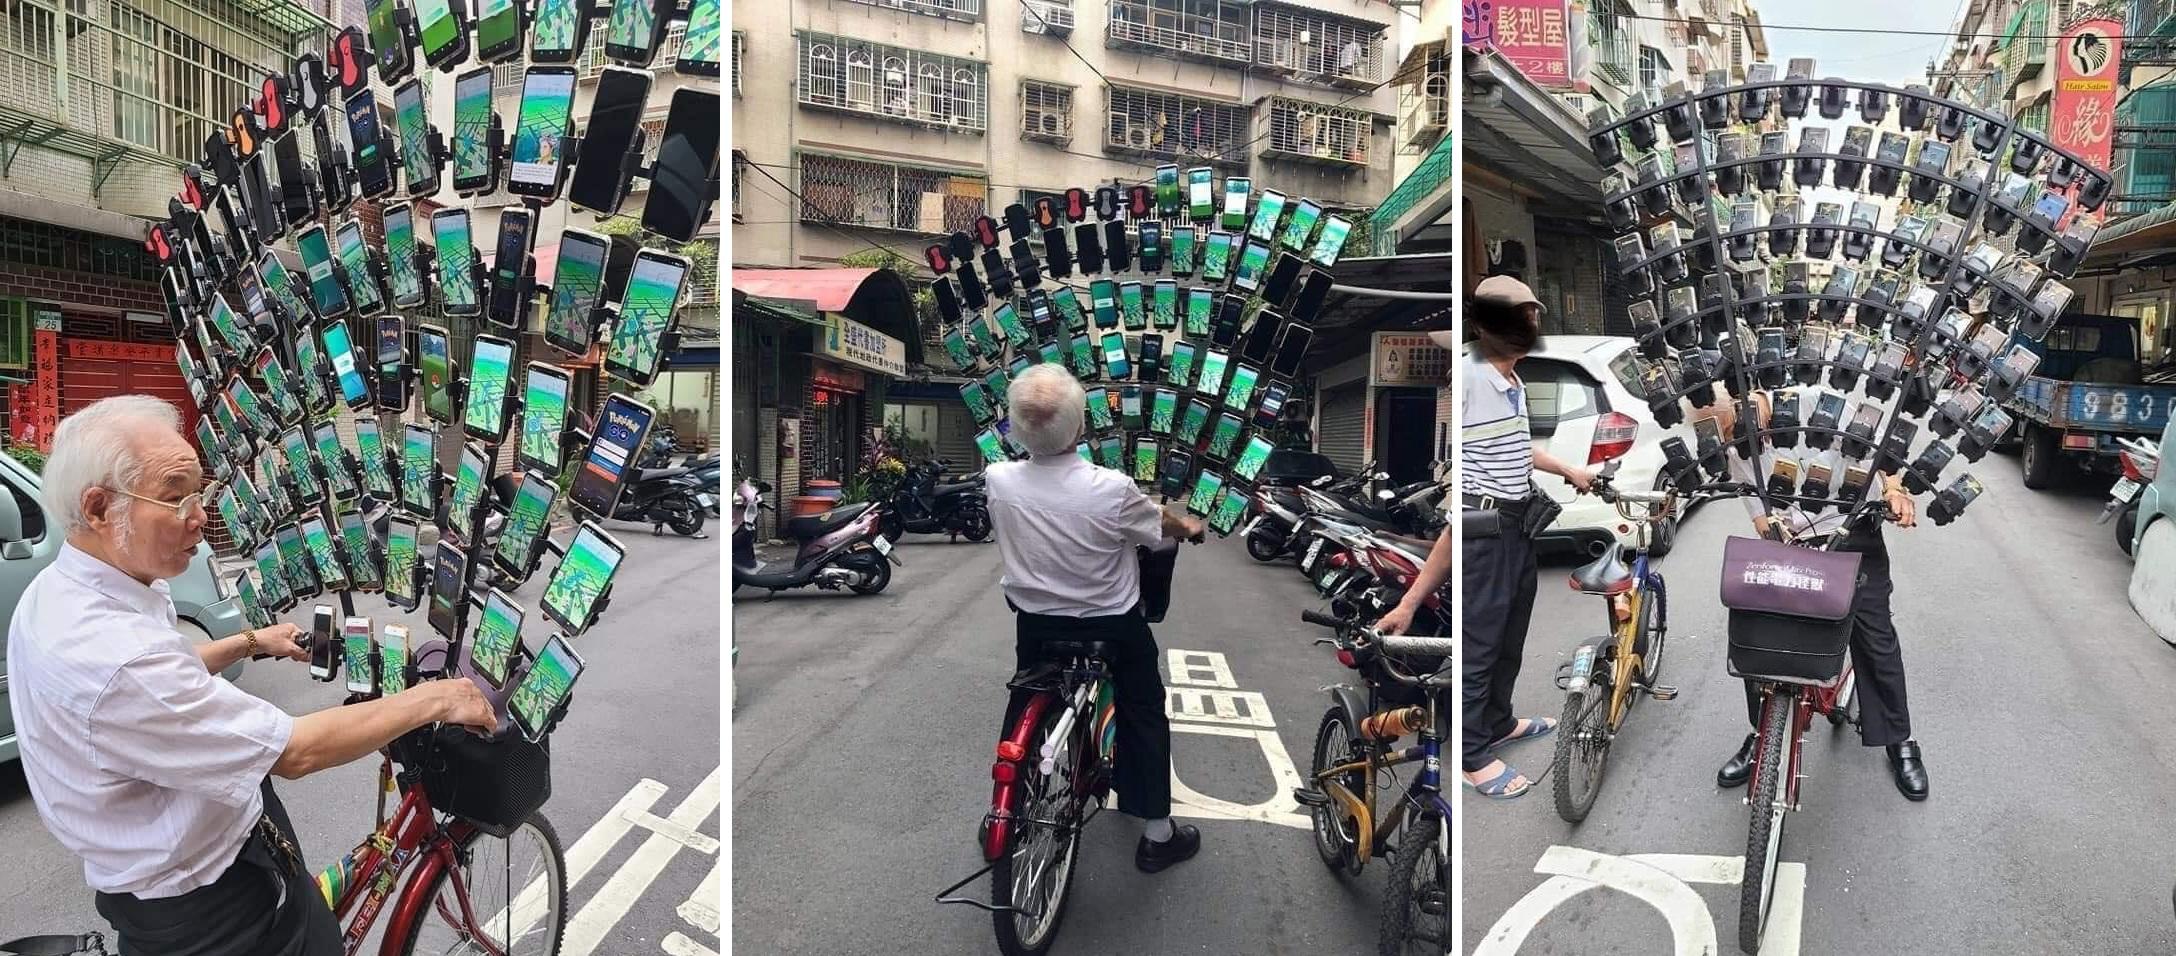 Kakek di Taiwan Bersepeda Sambil Main Pokemon Go di 64 Smartphone